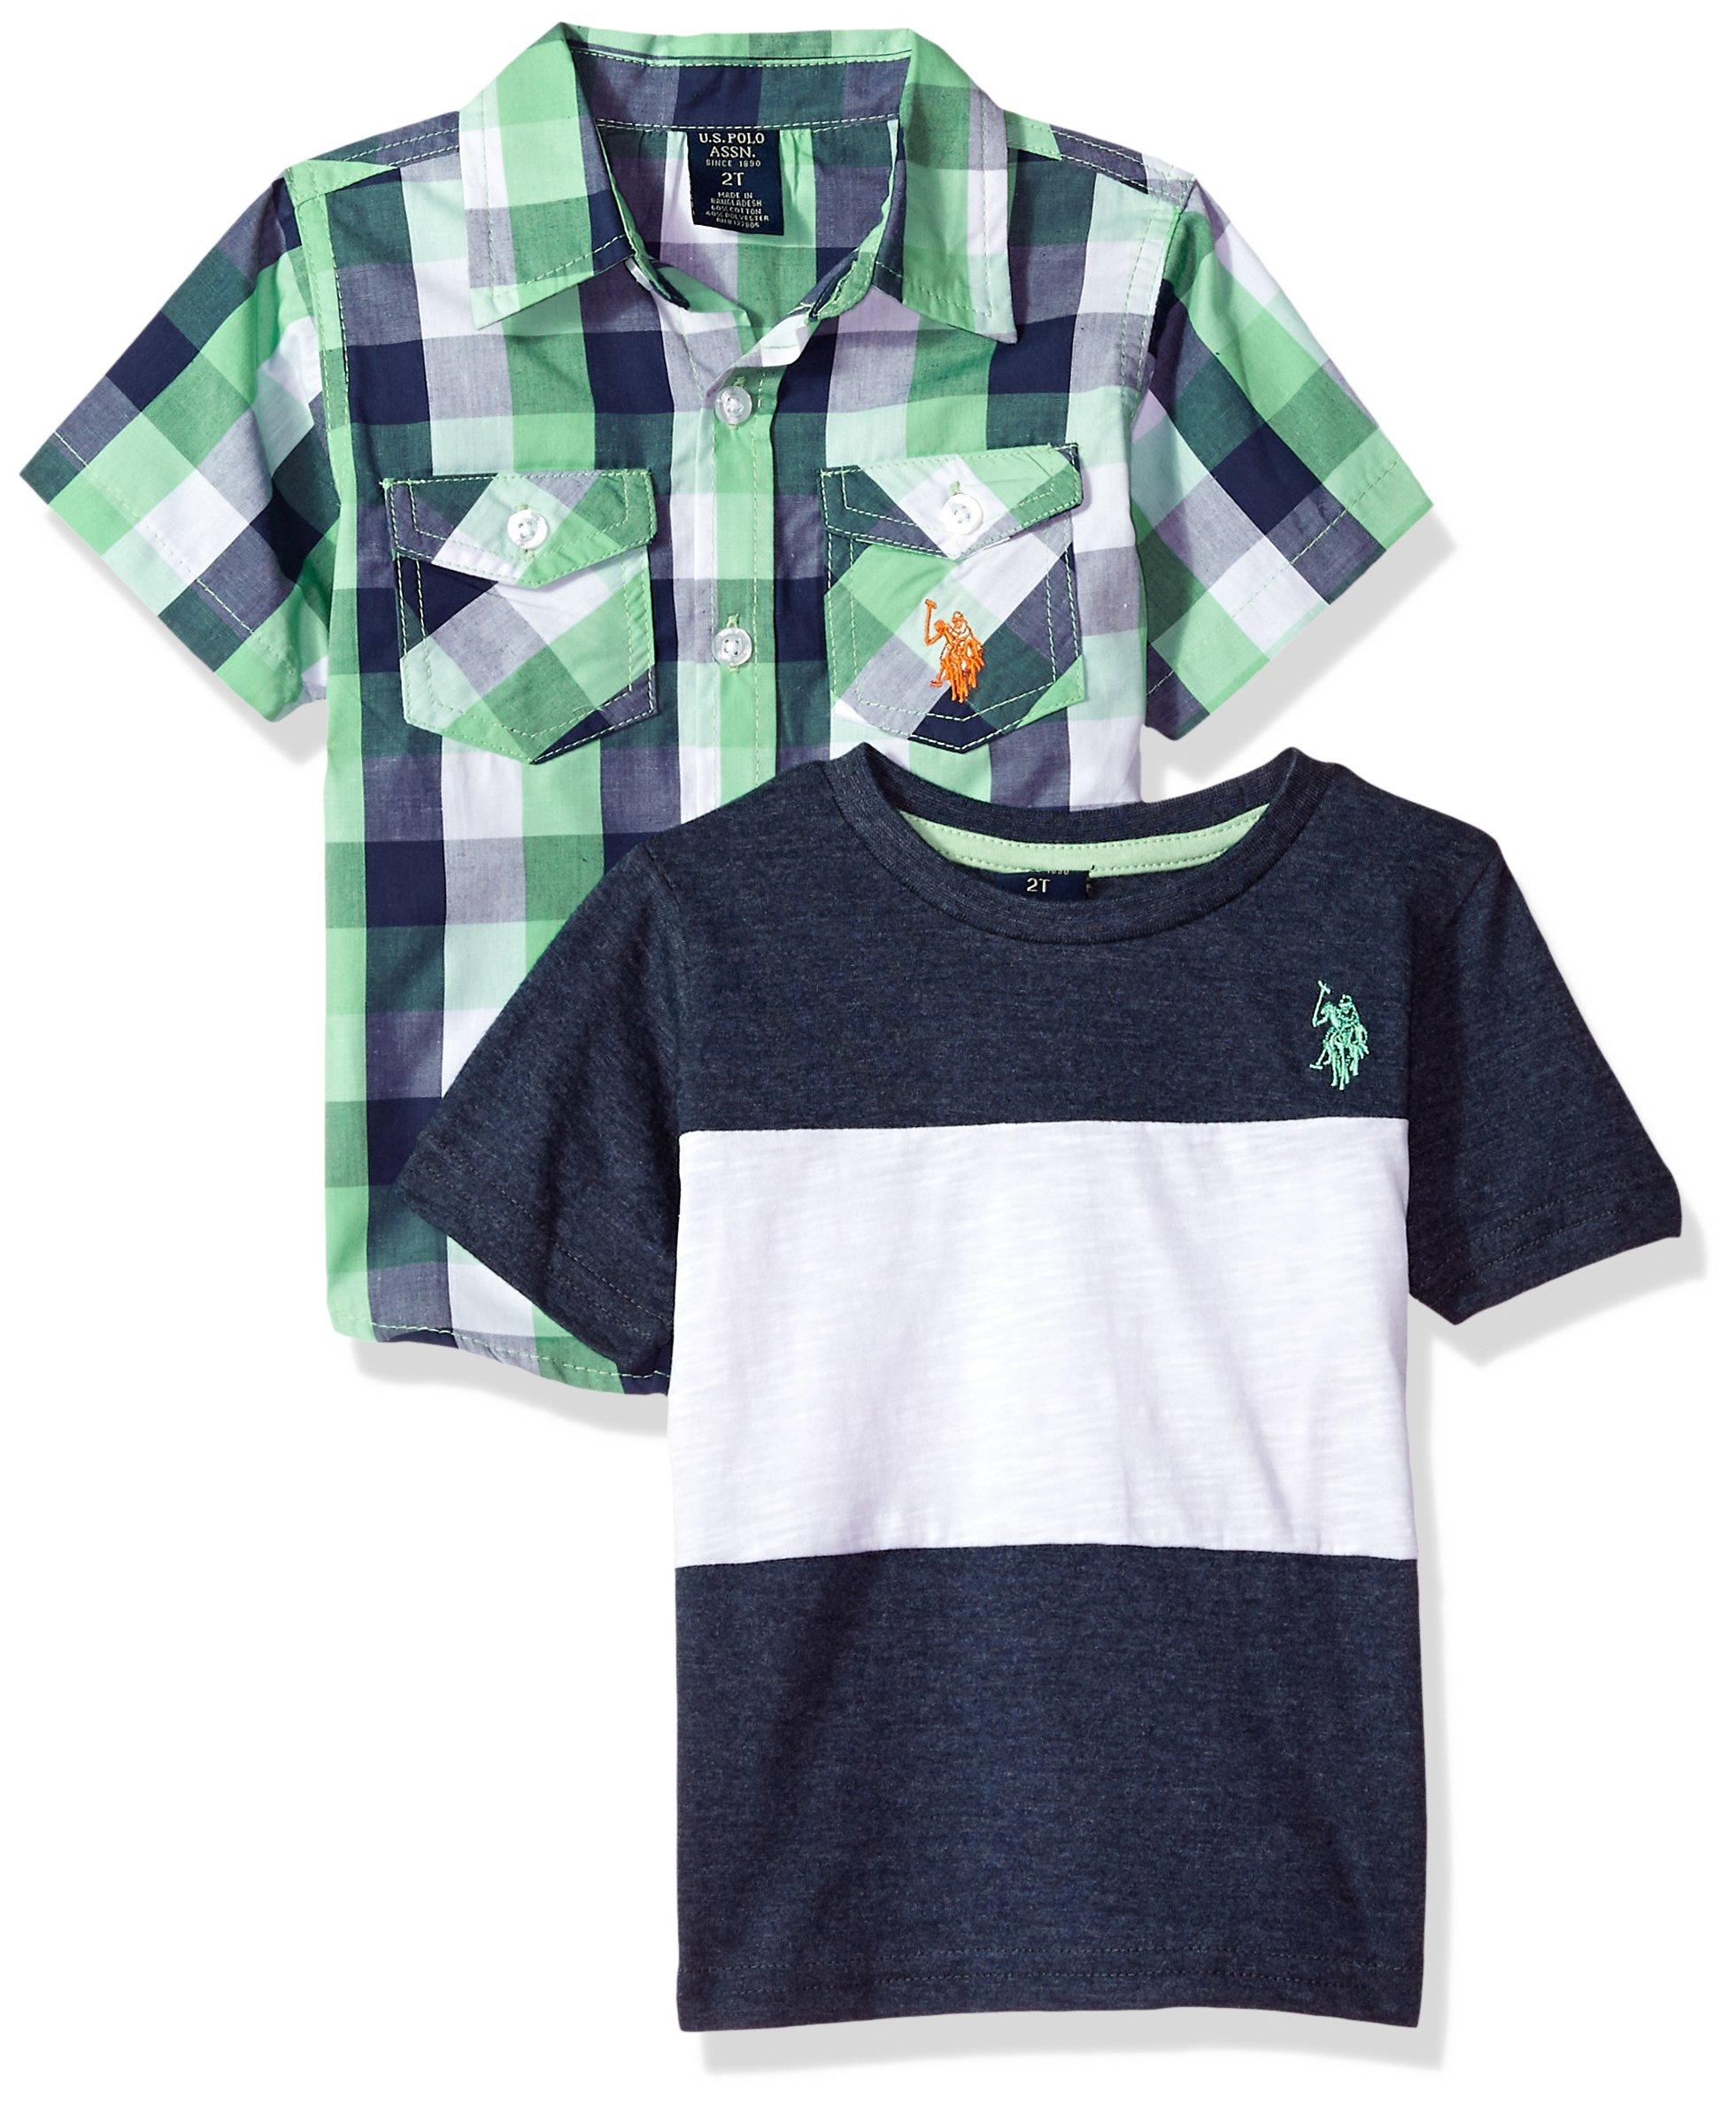 U.S. Polo Assn. Little Boys' Short Sleeve Woven Shirt and T-Shirt Set, Green Plaid Woven Thick Stripe El Indigo Blue Heather, 7